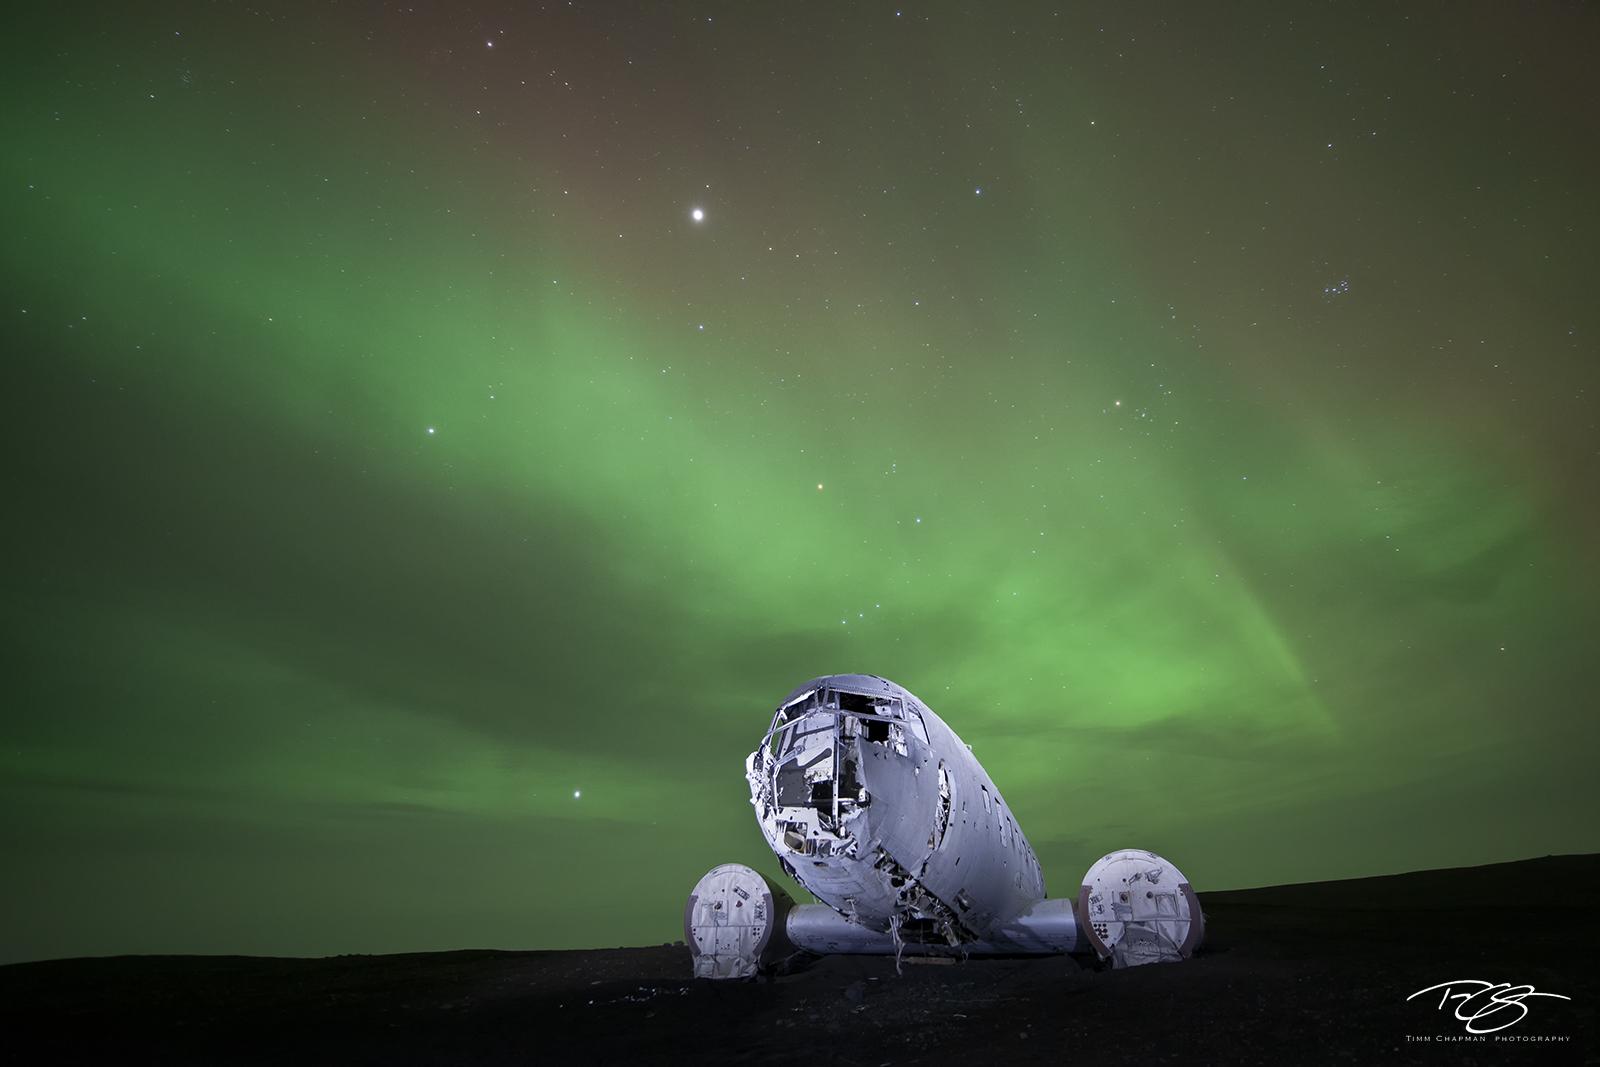 northern lights, aurora, aurora borealis, dc-3, dakota, c-47, airplane, aircraft, plane crash, wreckage, iceland, Sólheimasandur, apocalyptic, apocalypse, photo